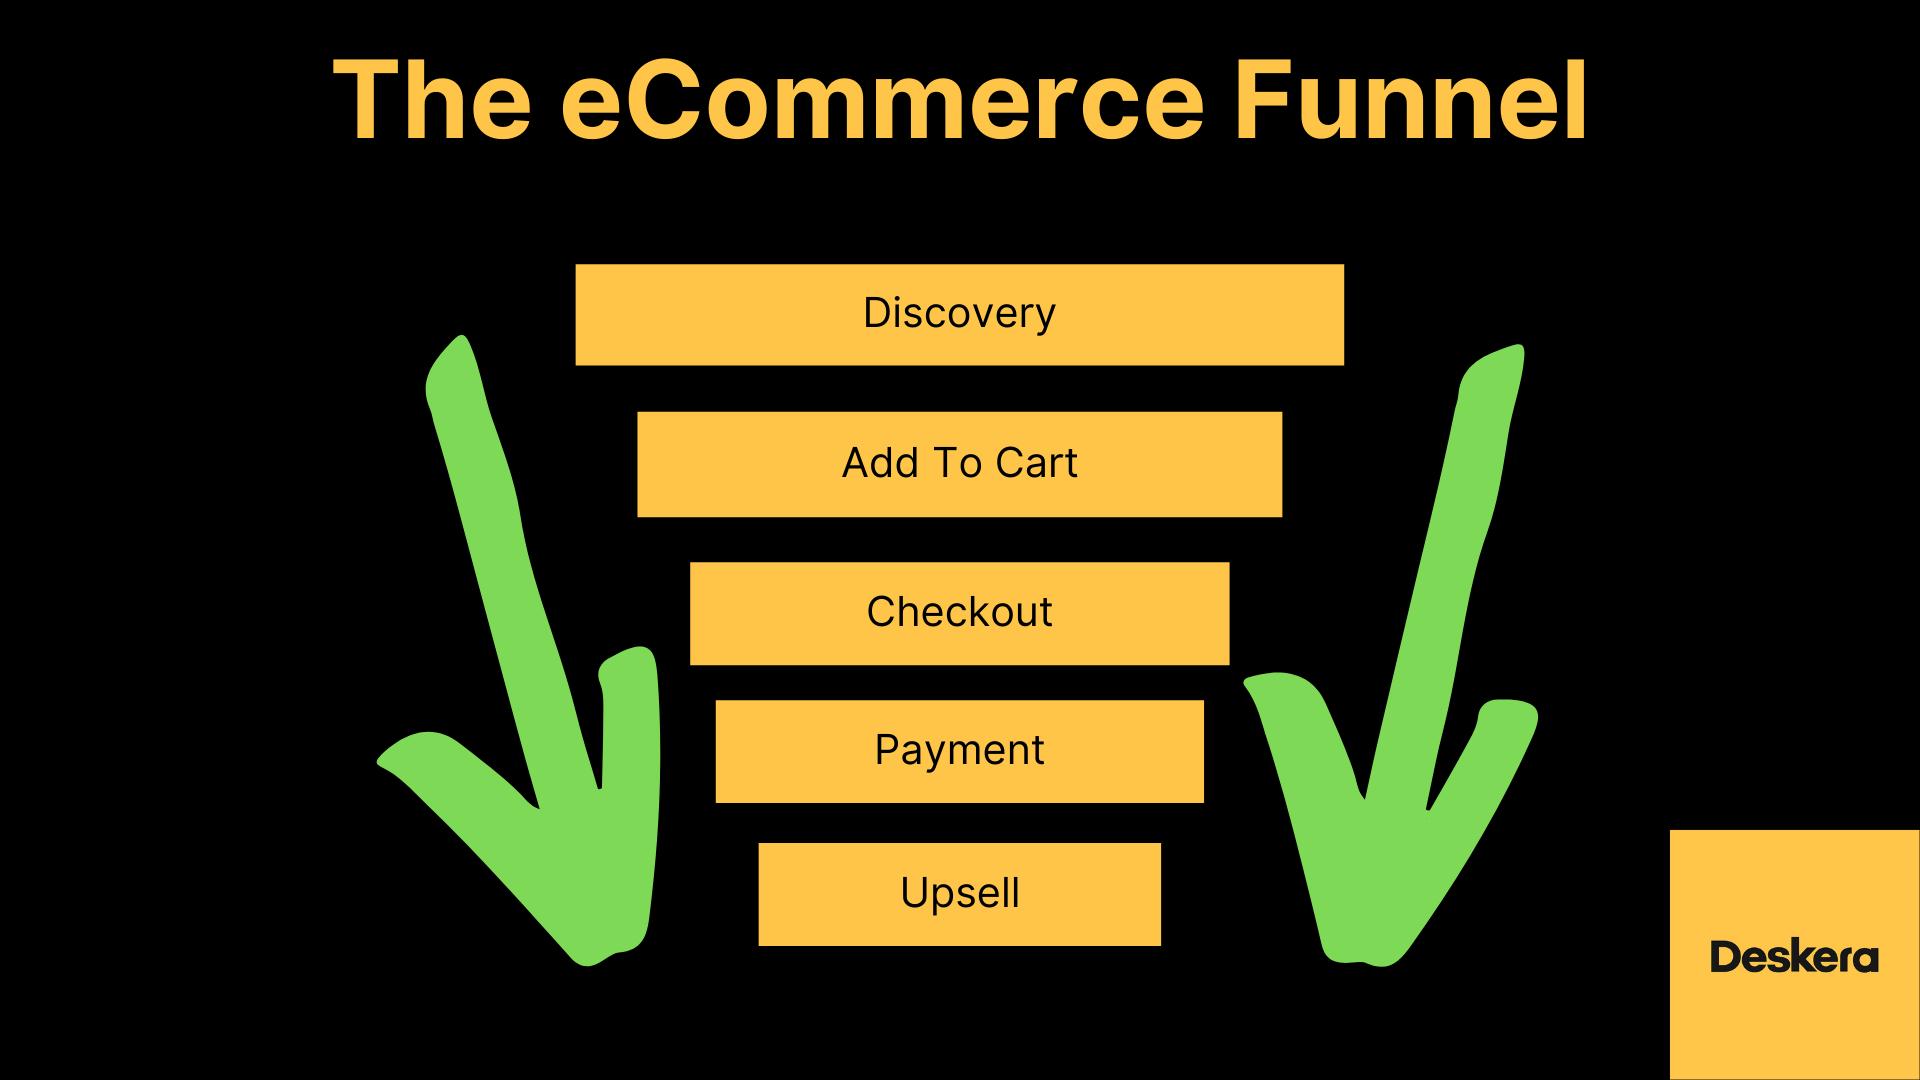 eCommerce Funnel